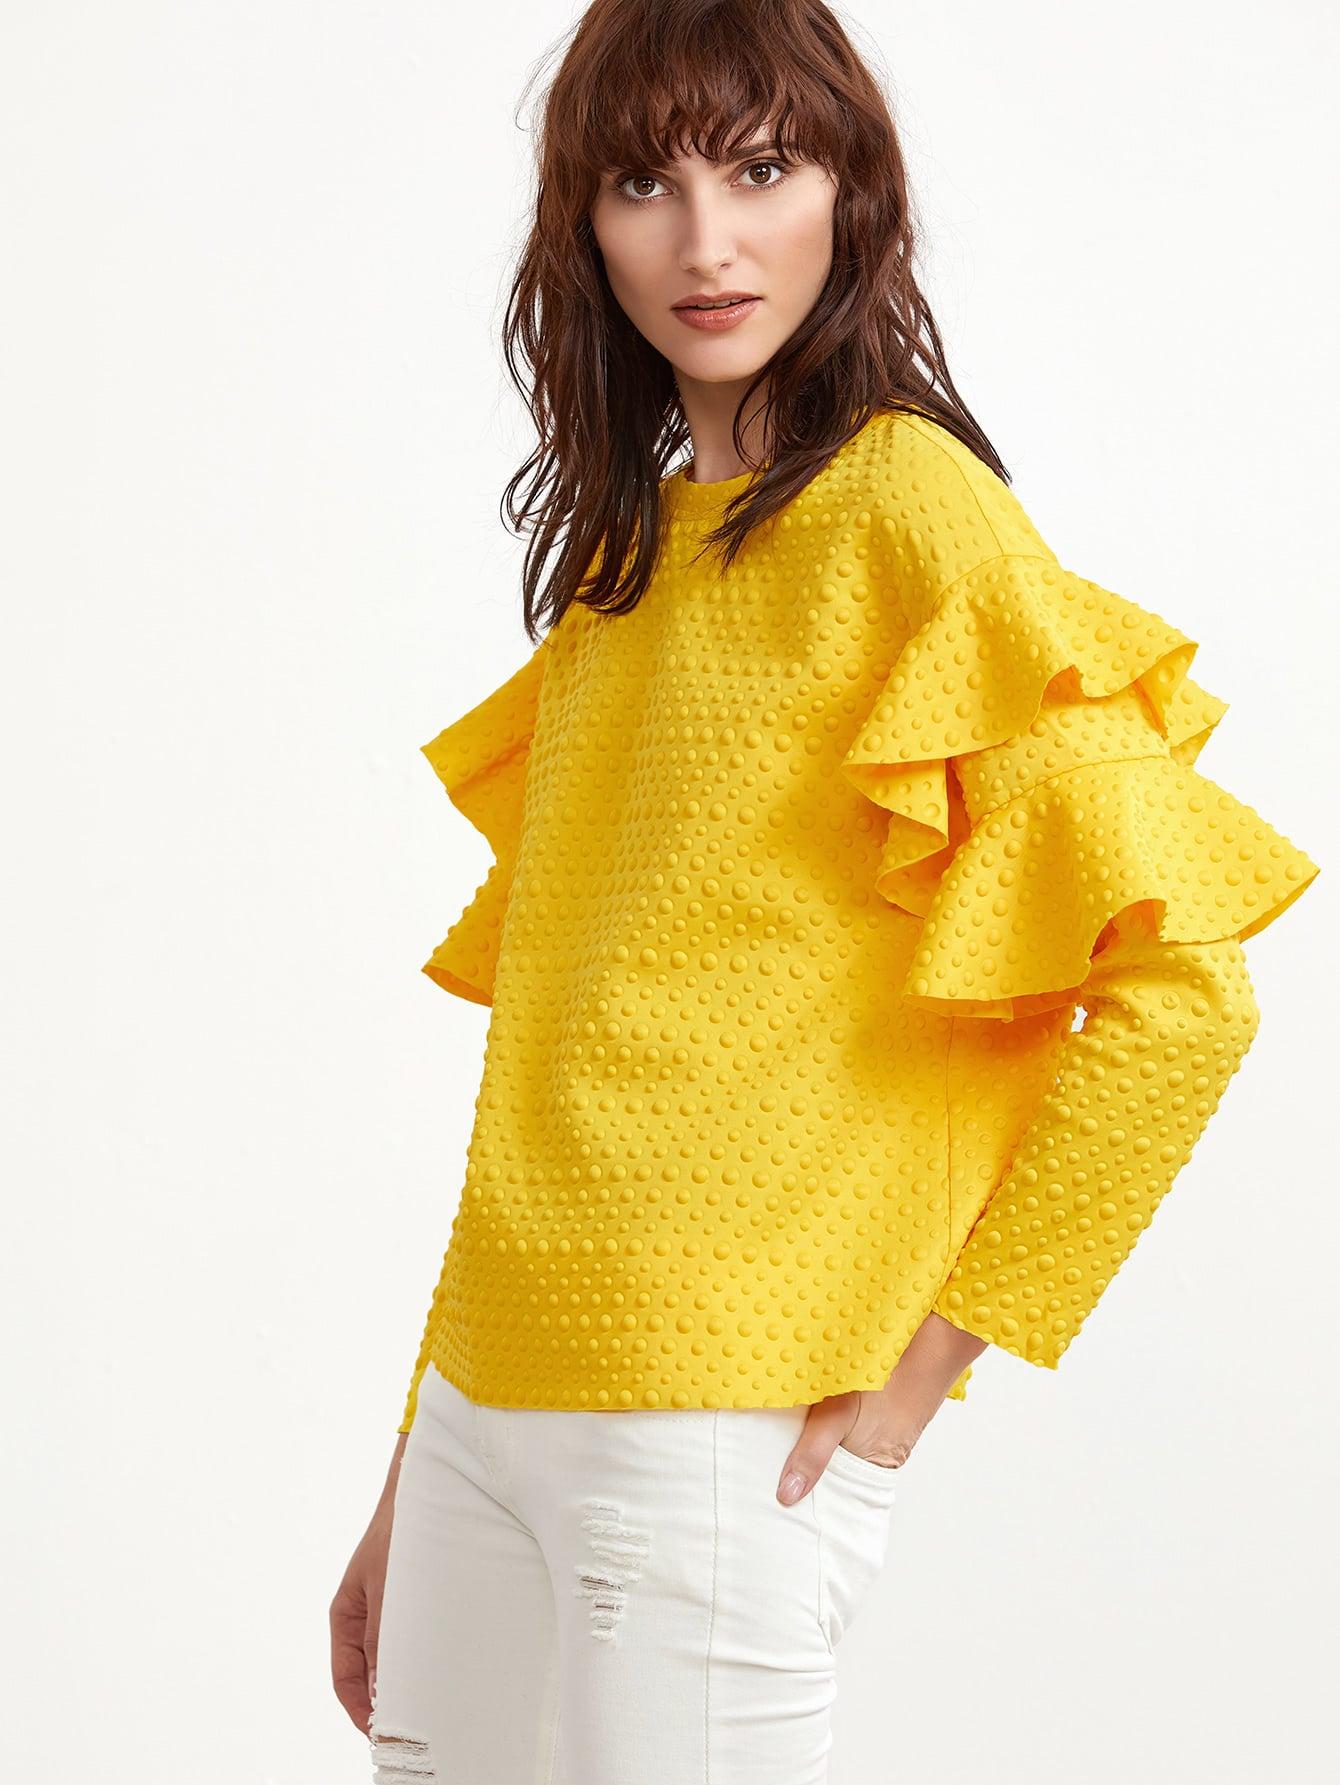 blouse161201705_2